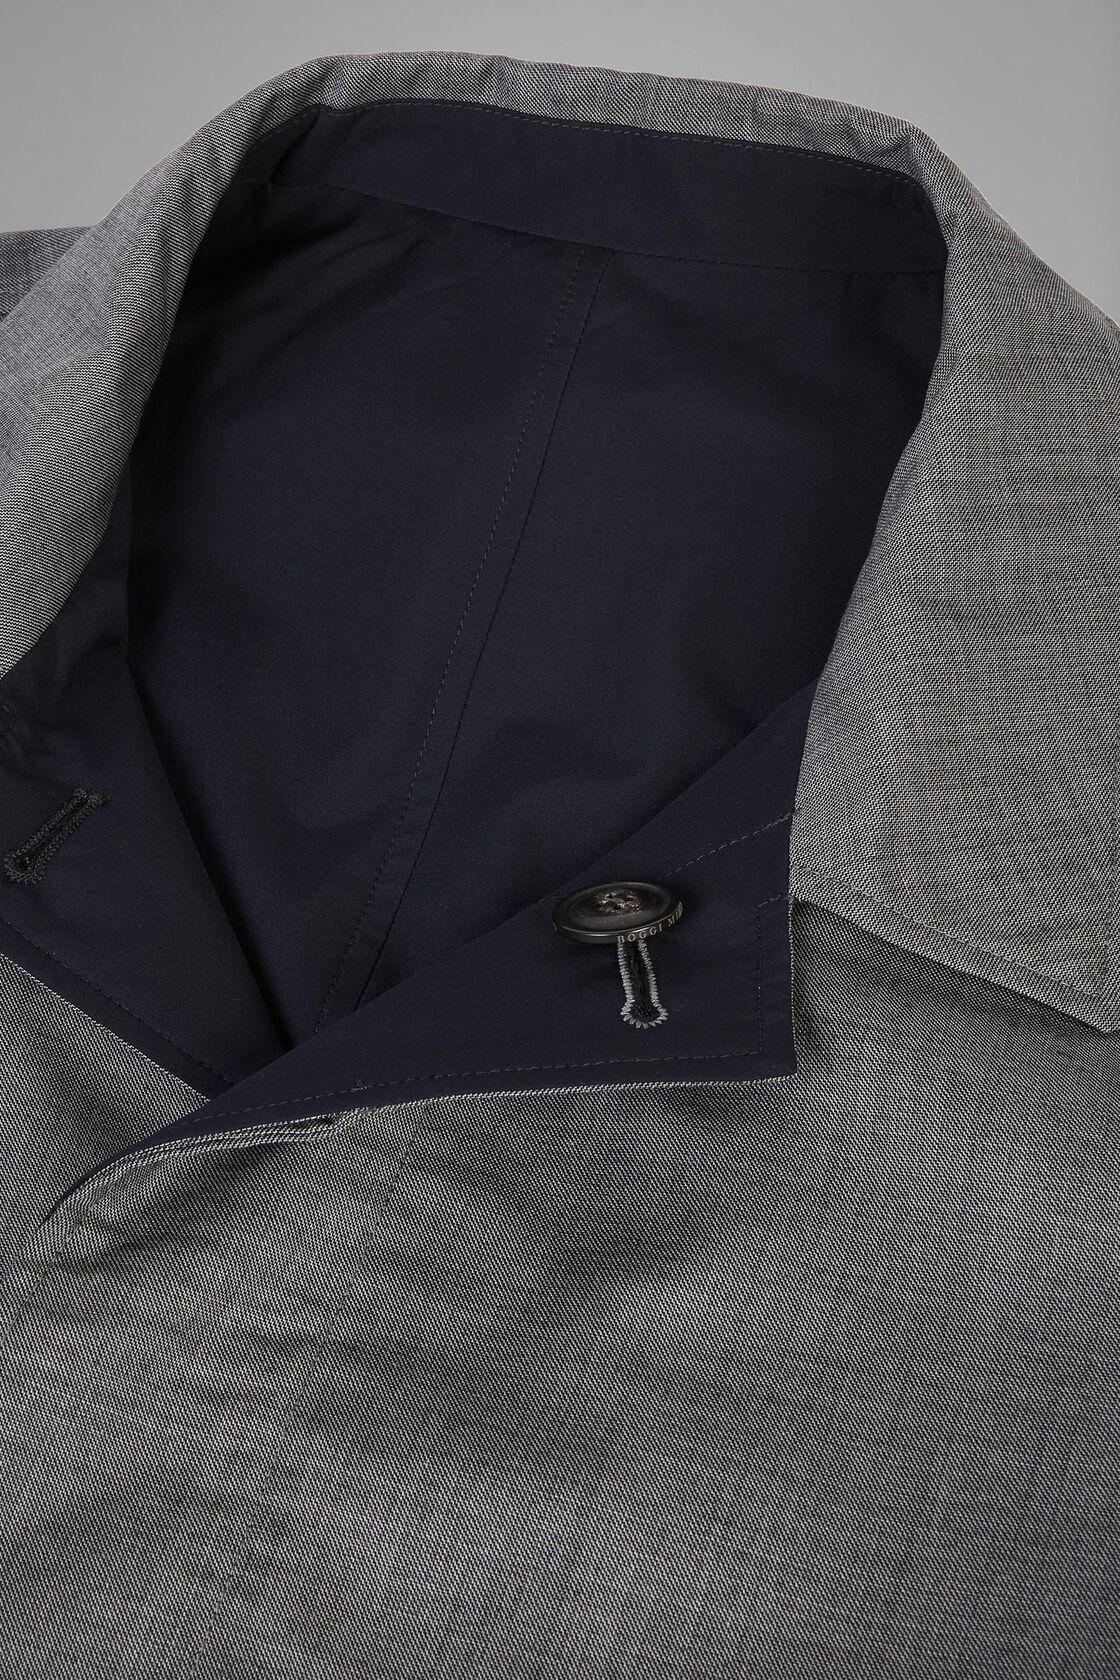 Wende-Regenmantel Aus Wolle, Grau Blau, hi-res